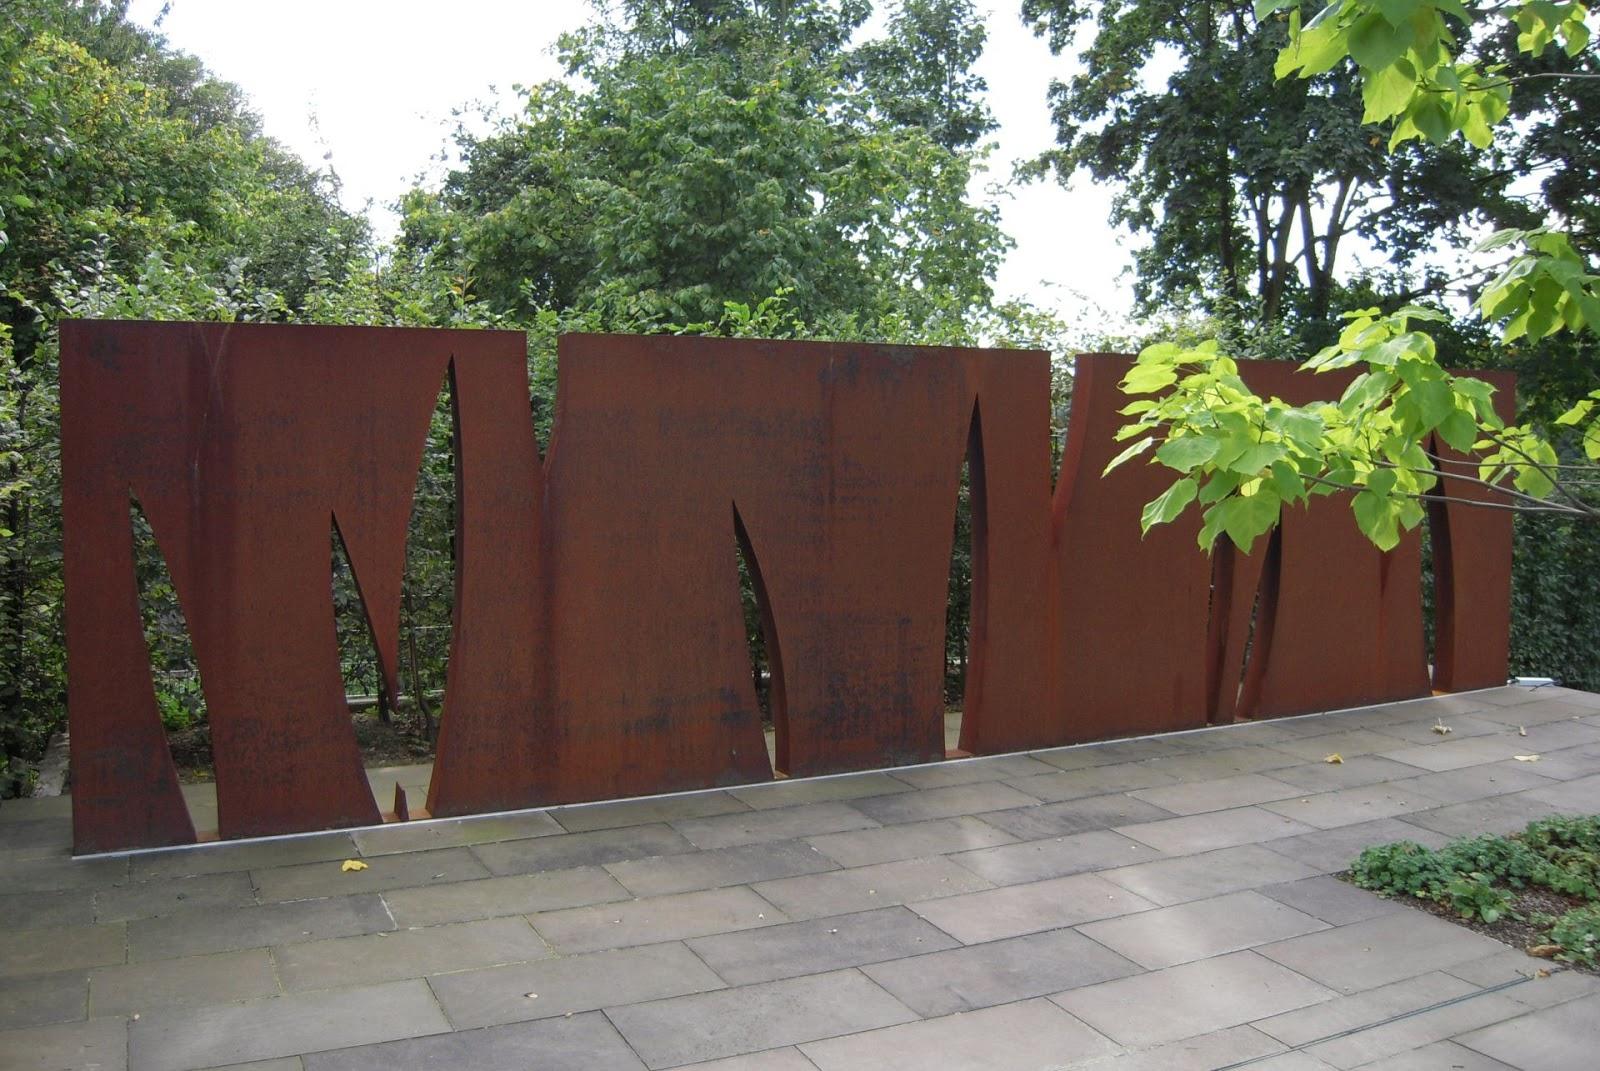 Gartenhaus Metall Mit Bodenplatte Metall Ger Tehaus